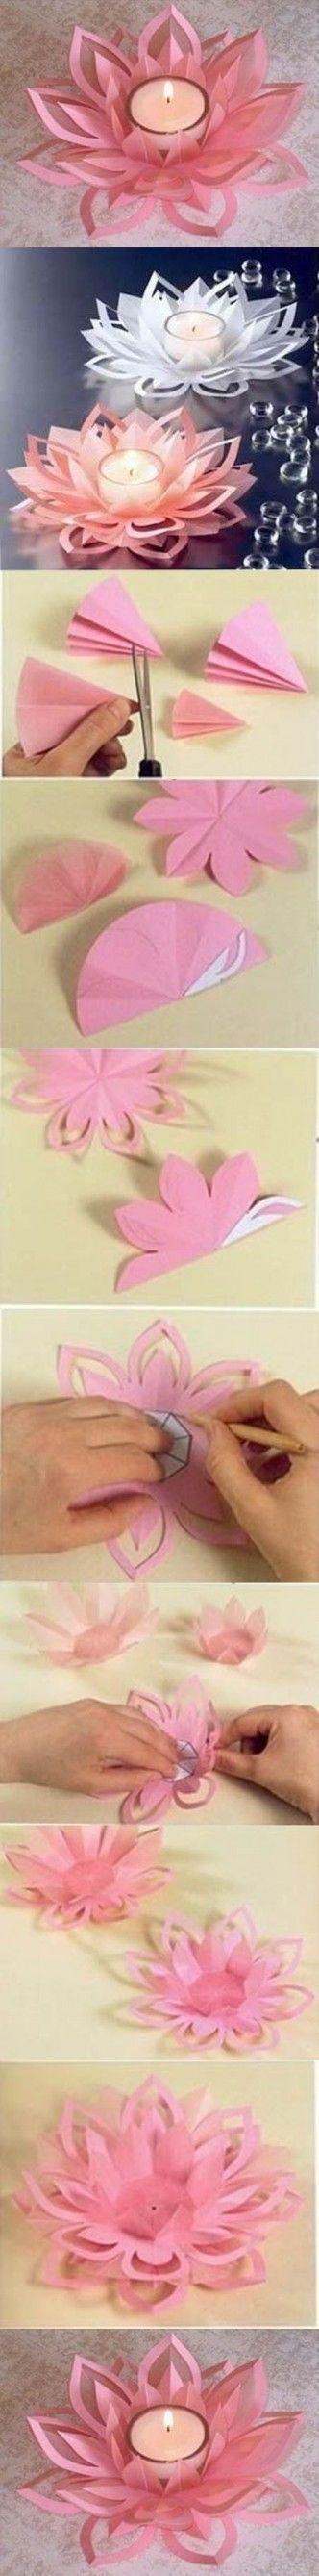 DIY Paper Lotus Candlestick